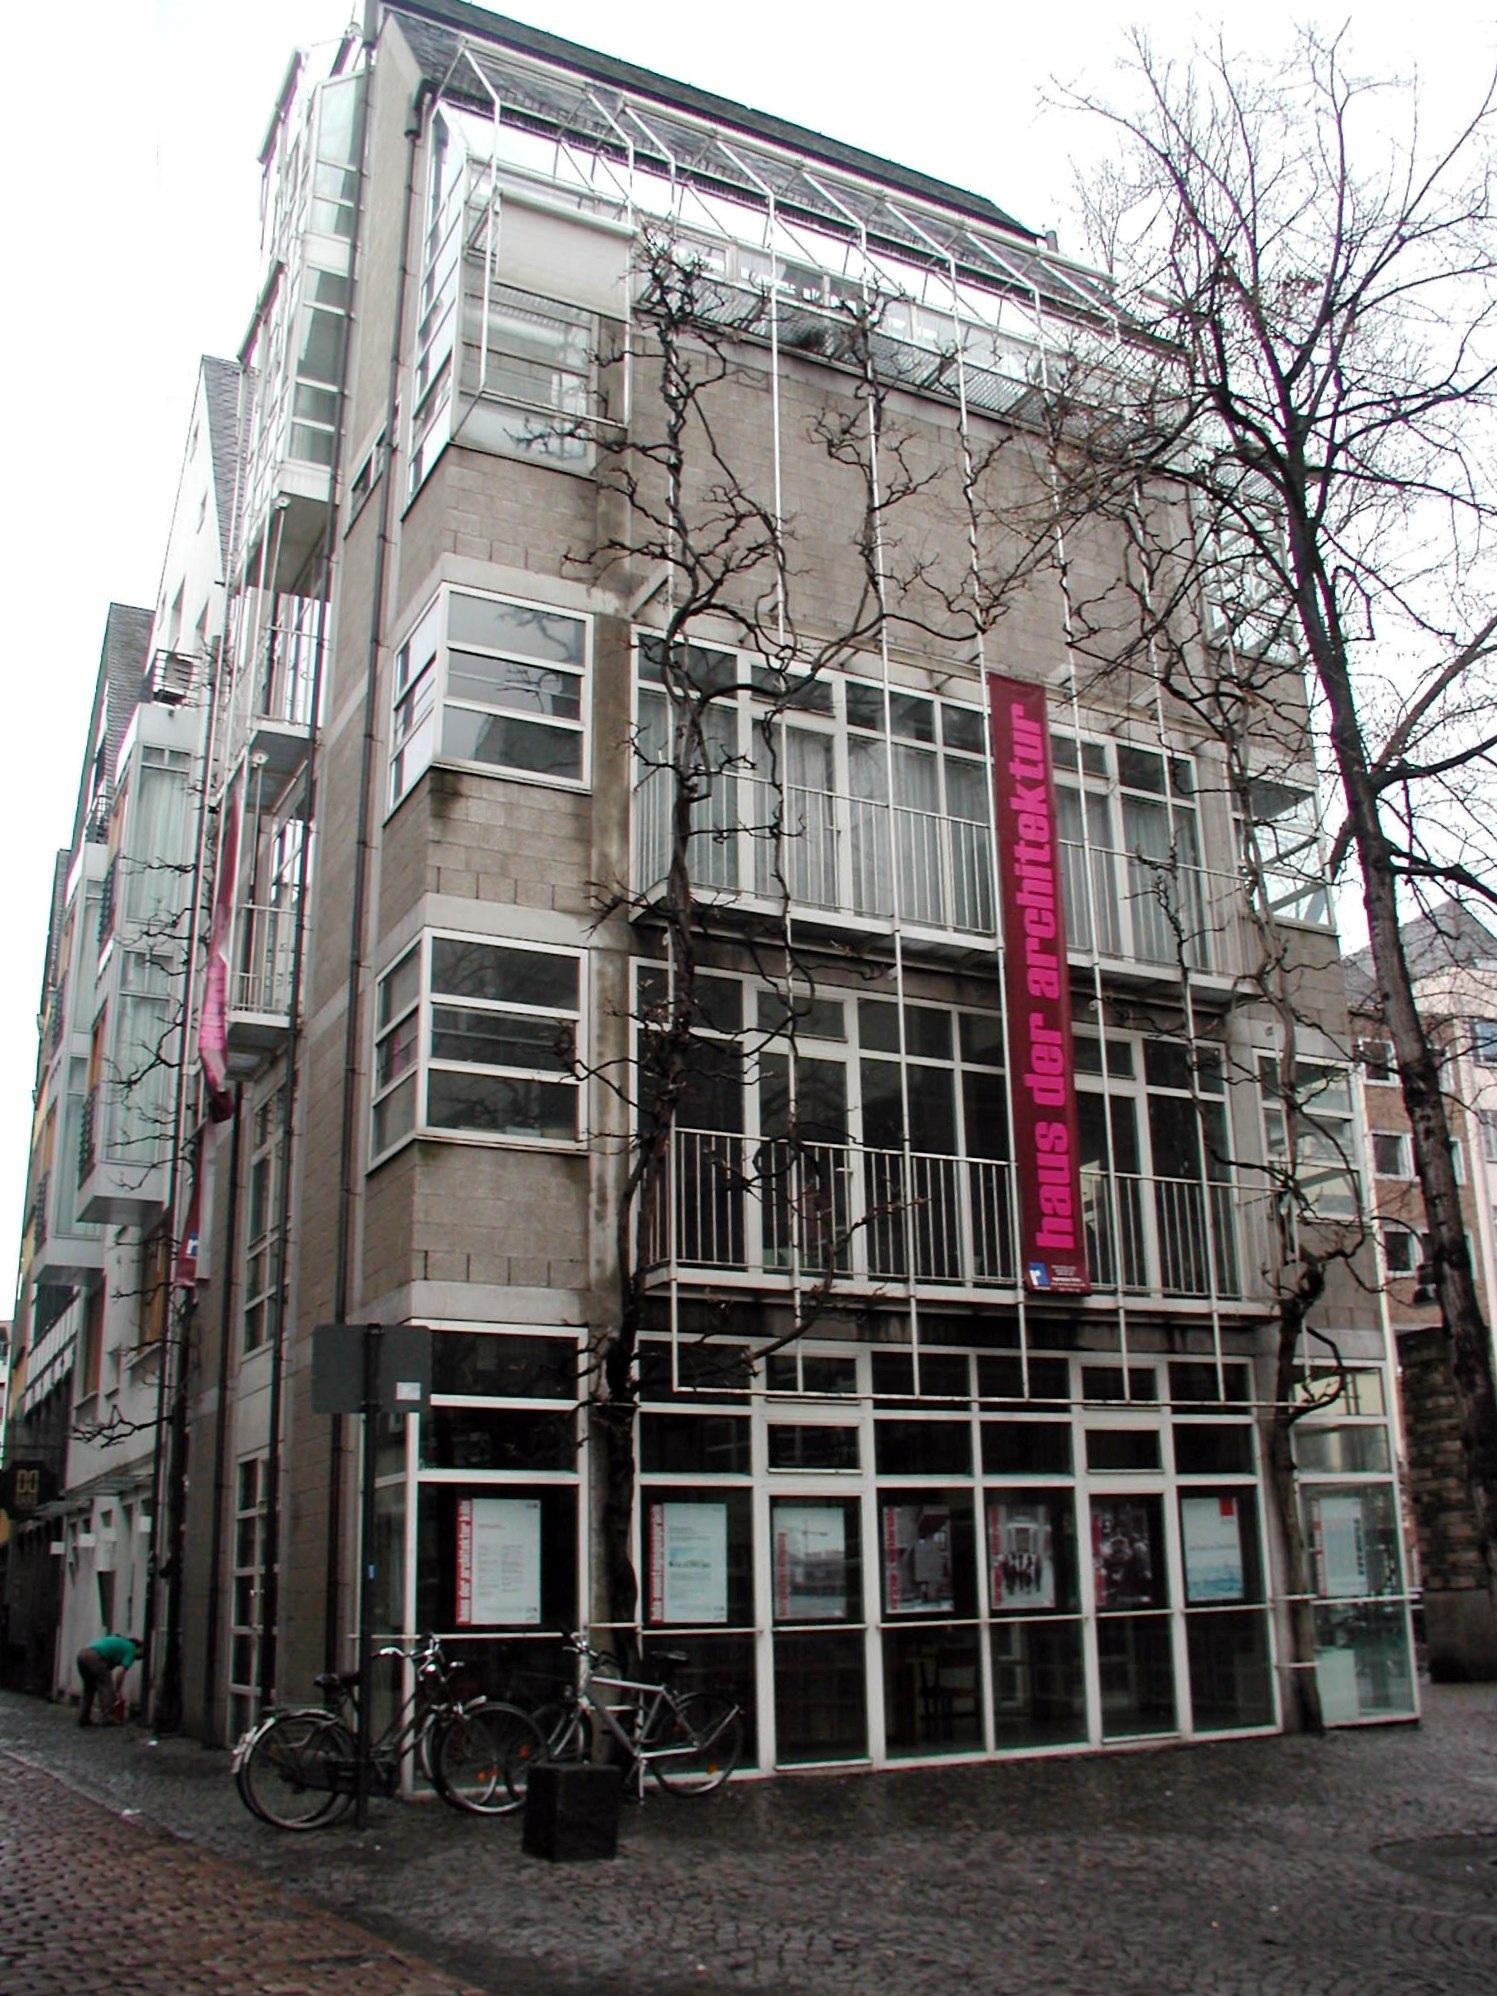 Architekten In Köln file lintgasse 9 köln haus der architektur 050 jpg wikimedia commons